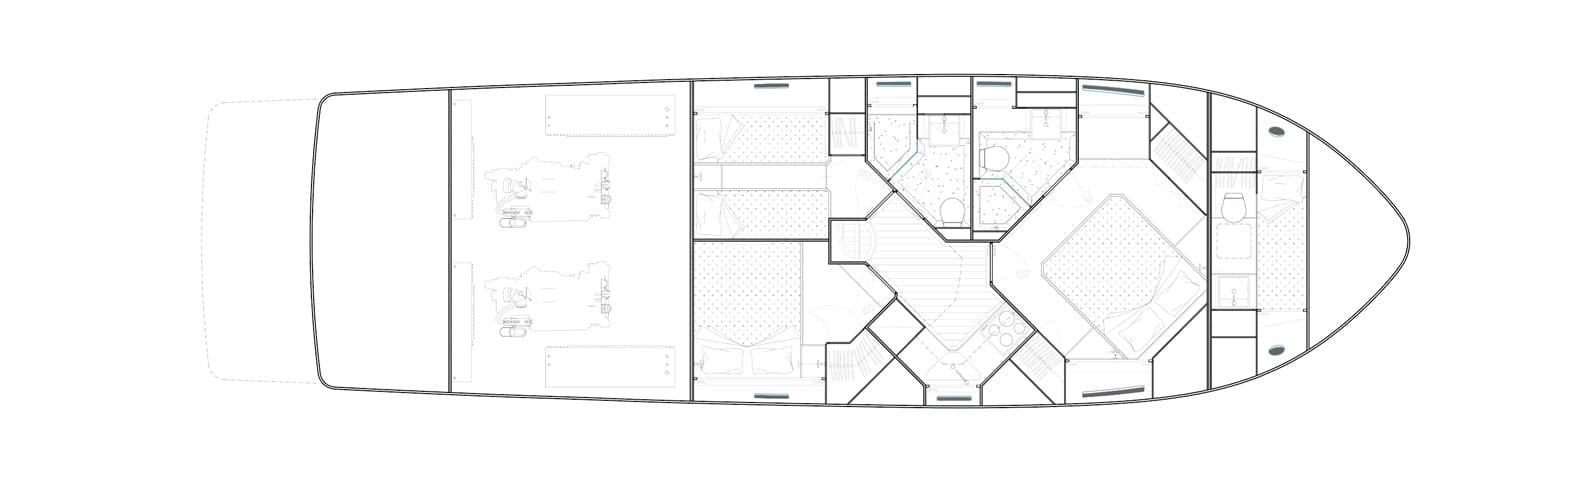 Uniesse-HT-6-Floor-3